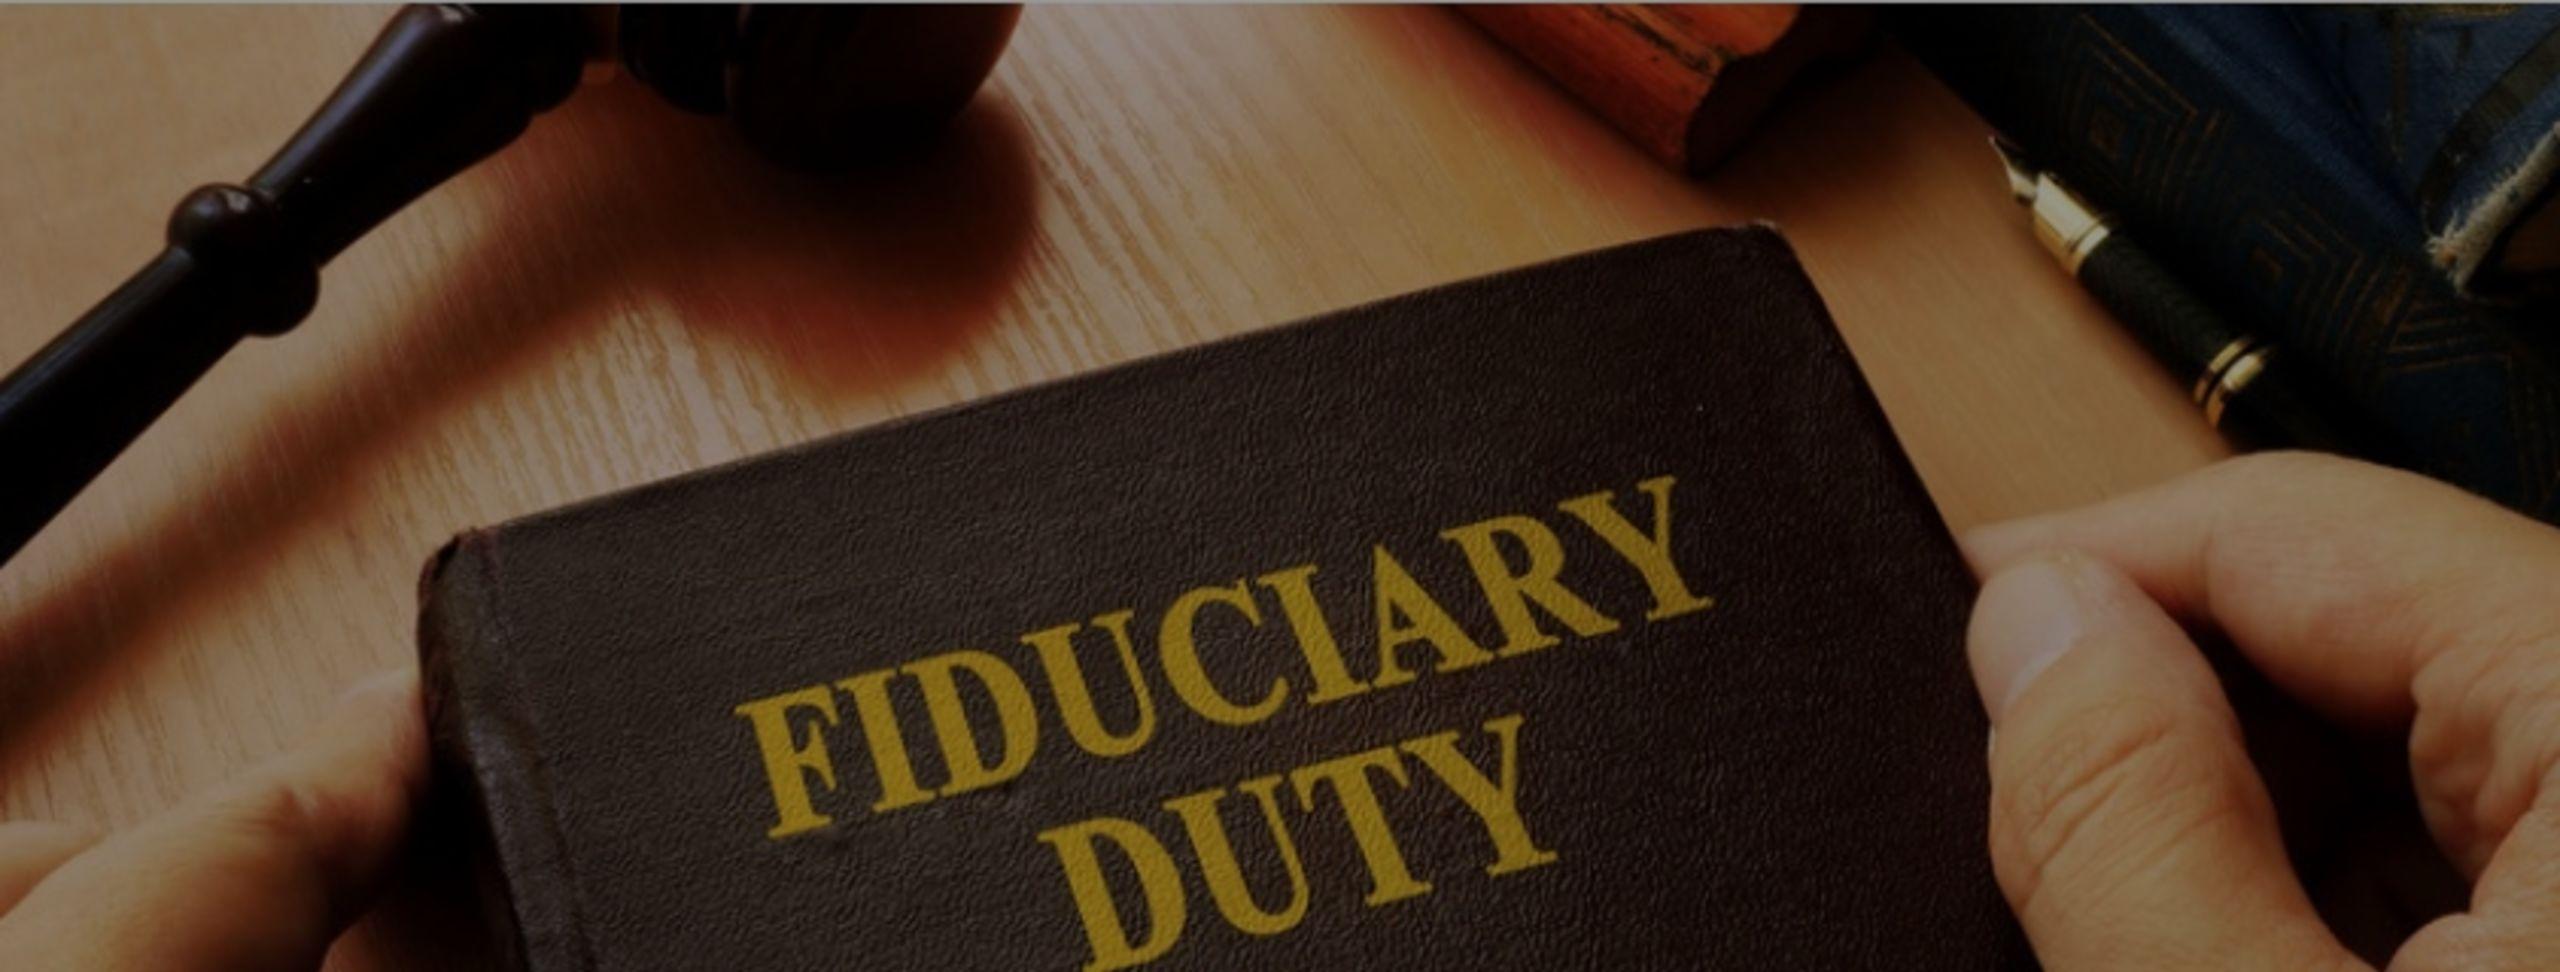 Fiduciary Duties – Confidentiality